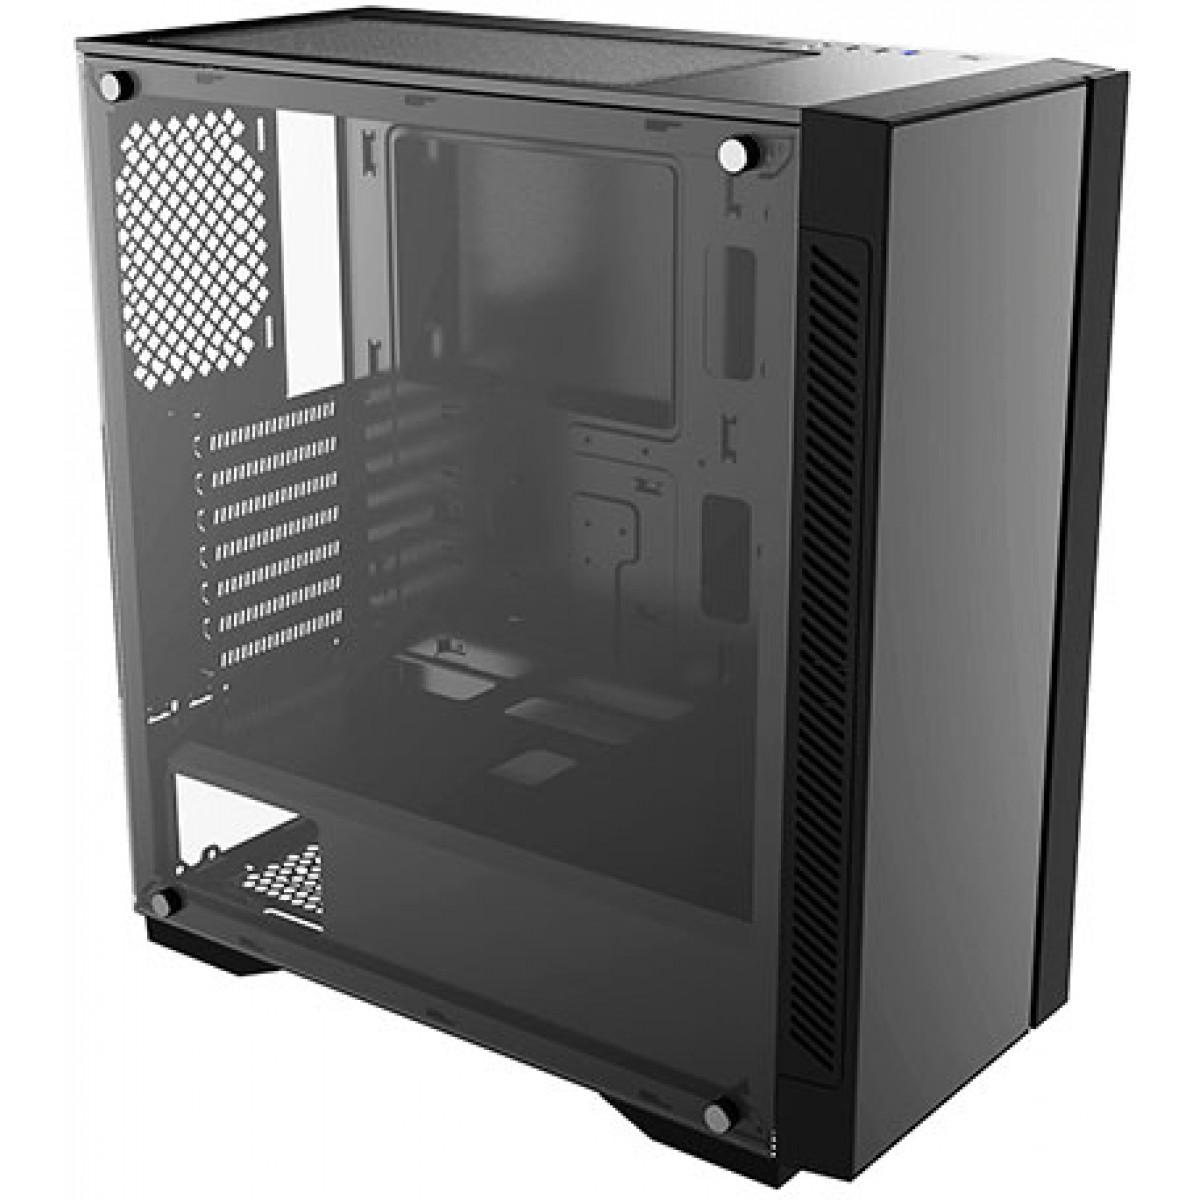 Gabinete Gamer DeepCool Matrexx 55 V3, Mid Tower, Vidro Temperado, Black, DP-ATX-MATREXX55V3, Sem Fonte, Sem Fan